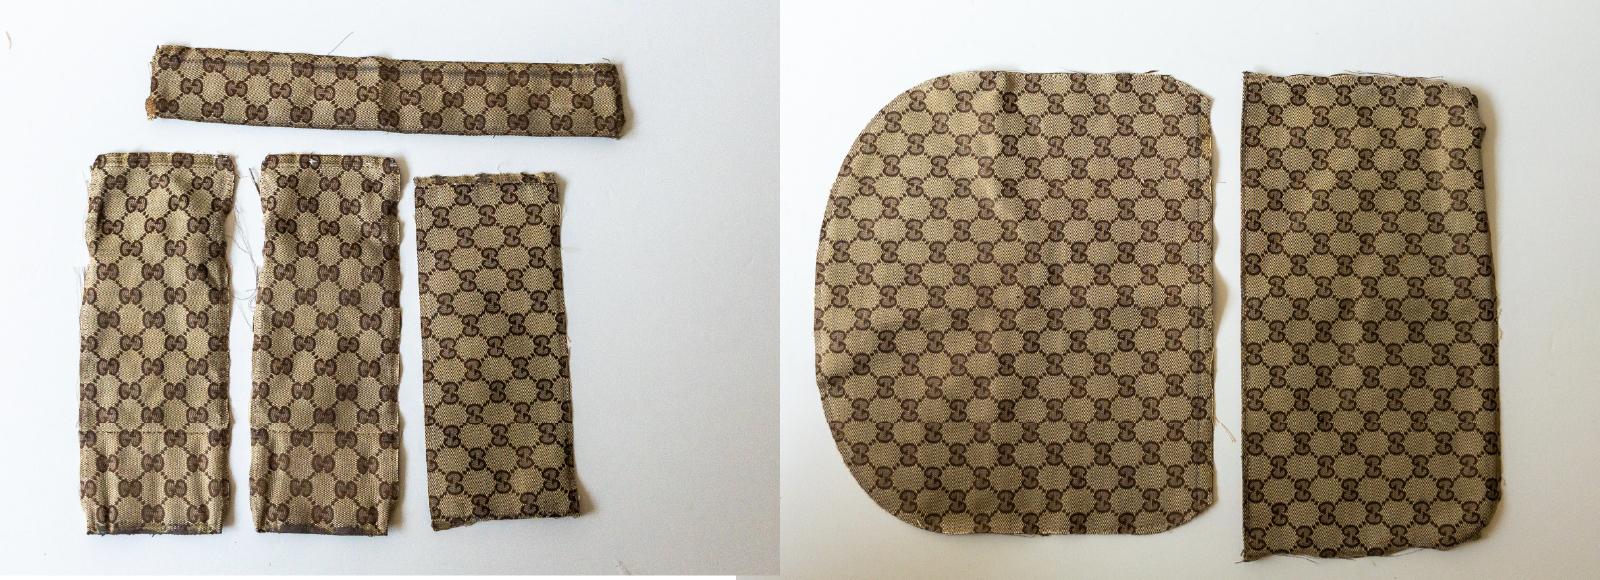 Gucci 1955 Horsebit 马衔扣肩背包